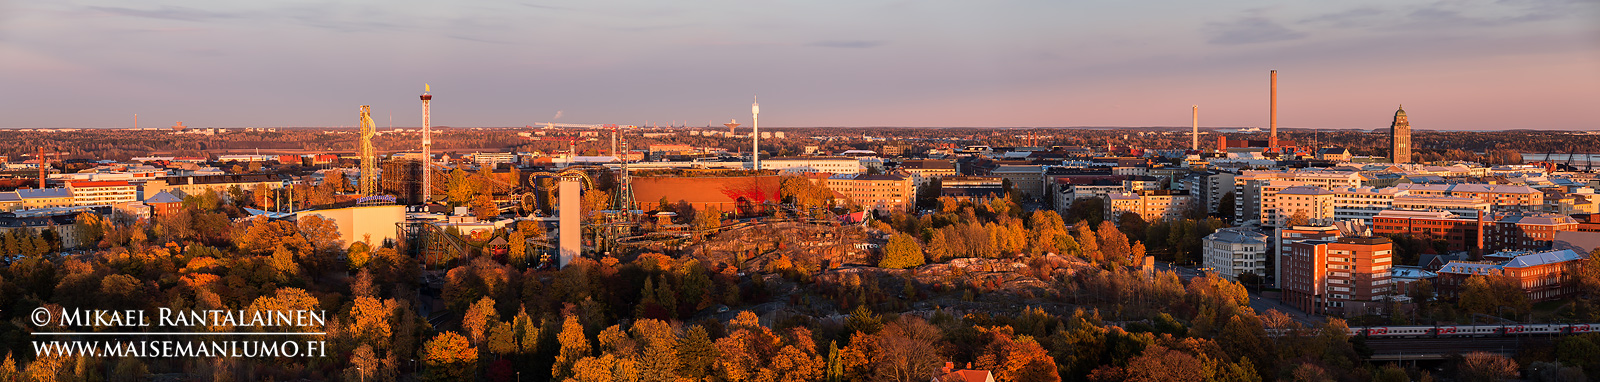 Linnanmäki Olympiastadionin tornista, Helsinki (HP119)